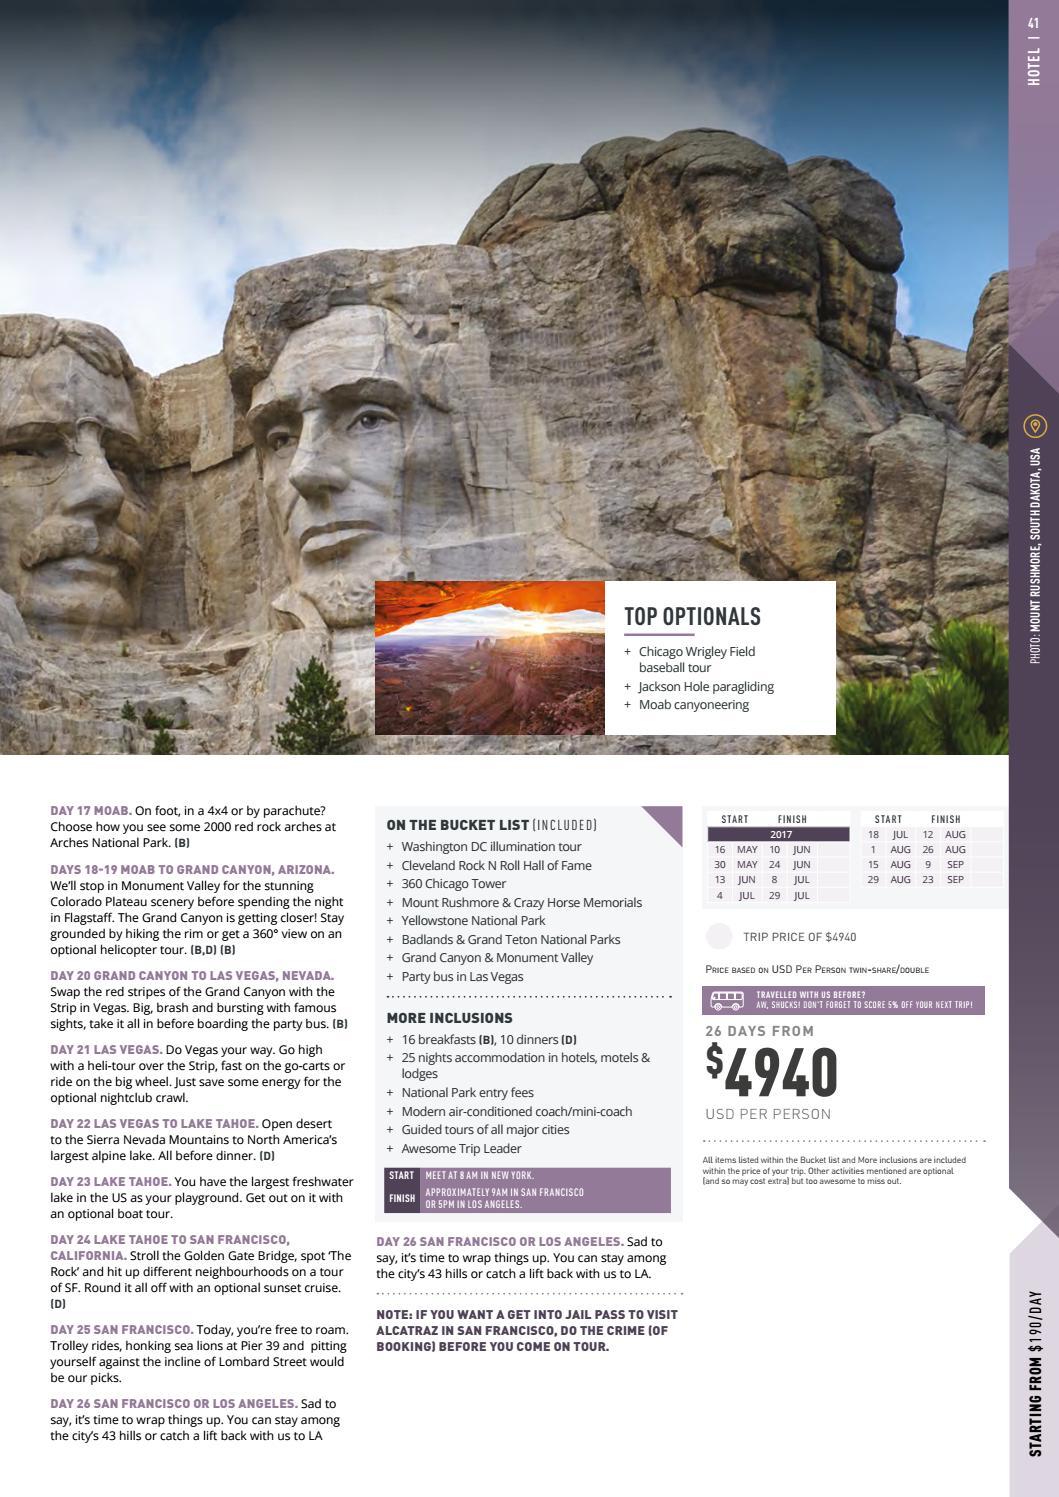 Topdeck - USA e Canadá - 2017/2018 by MMTGapnet Tours - issuu